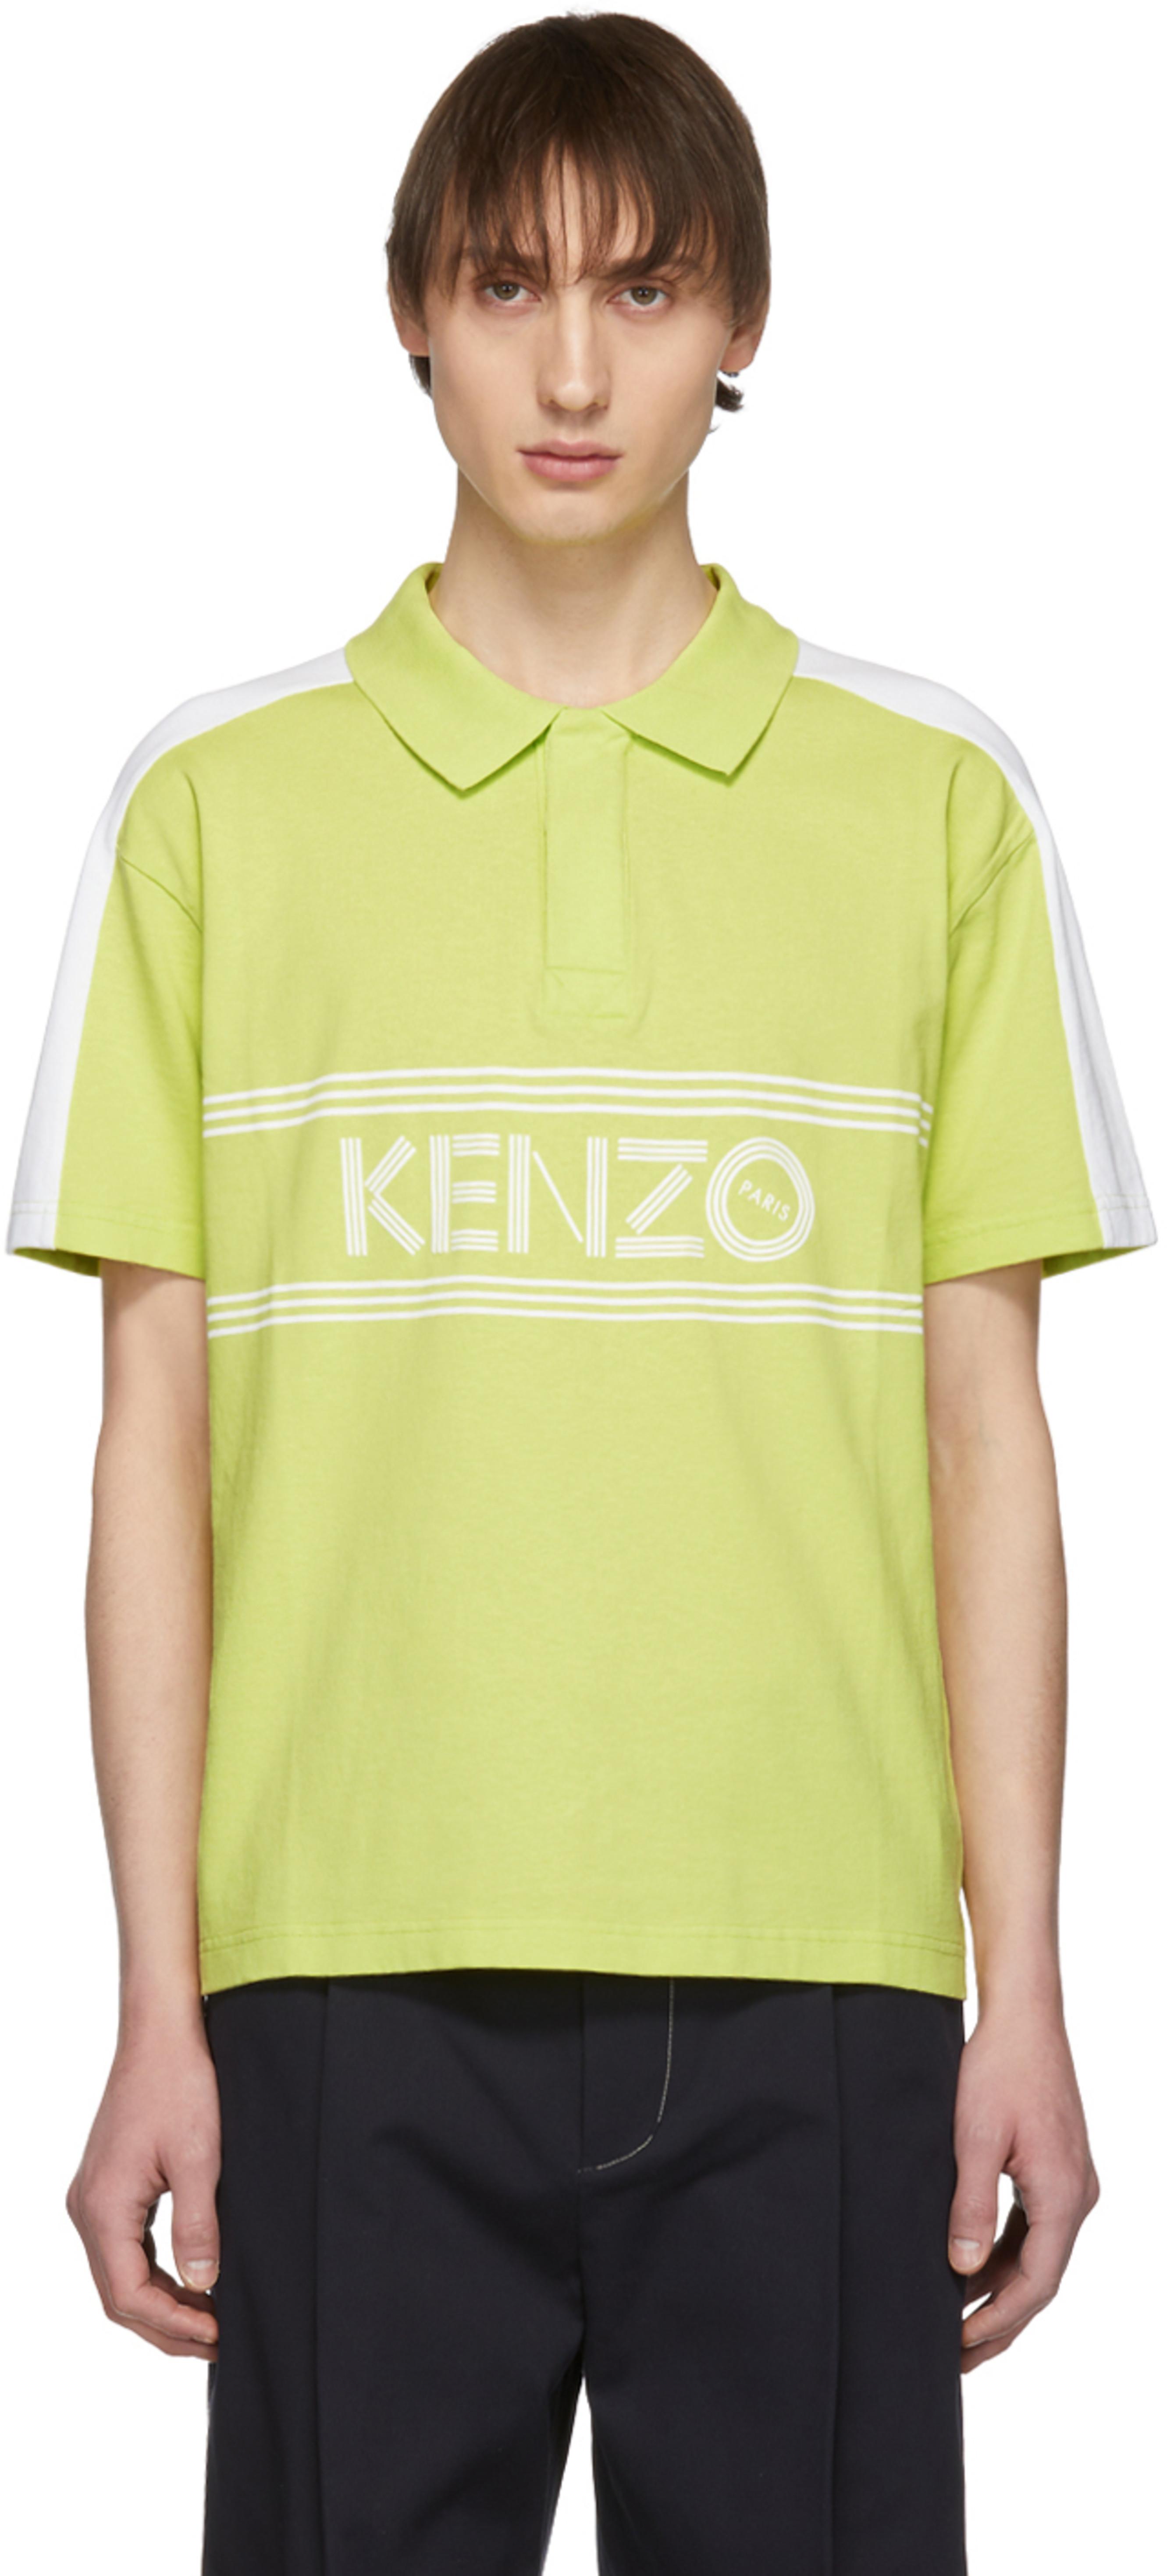 d16ed5929 Kenzo clothing for Men | SSENSE Canada